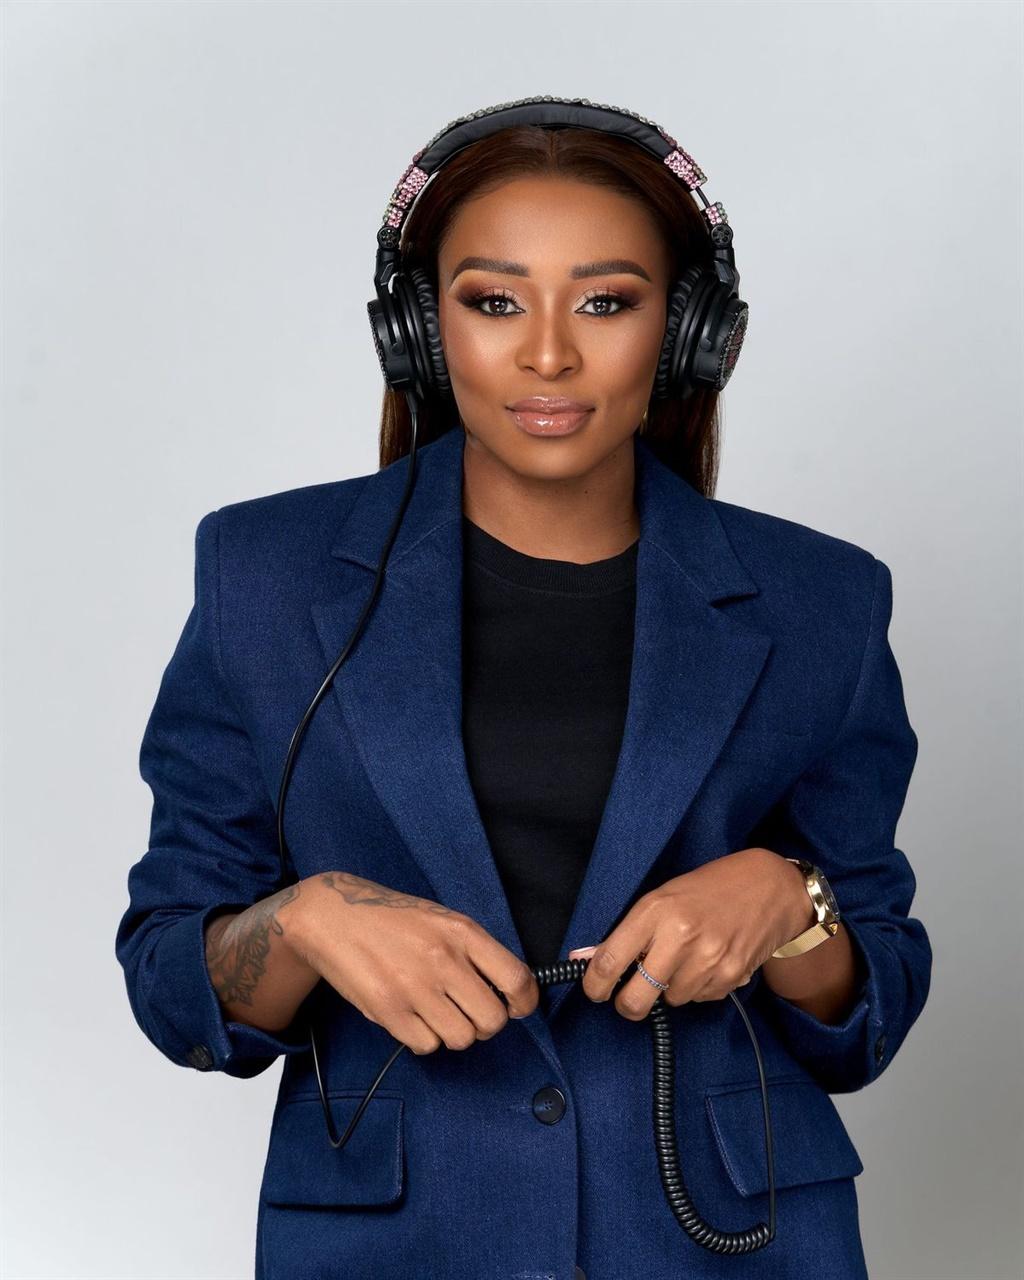 DJ Zinhle will soon launch an eyewear line. Picture: Sheila Afari (SAG)